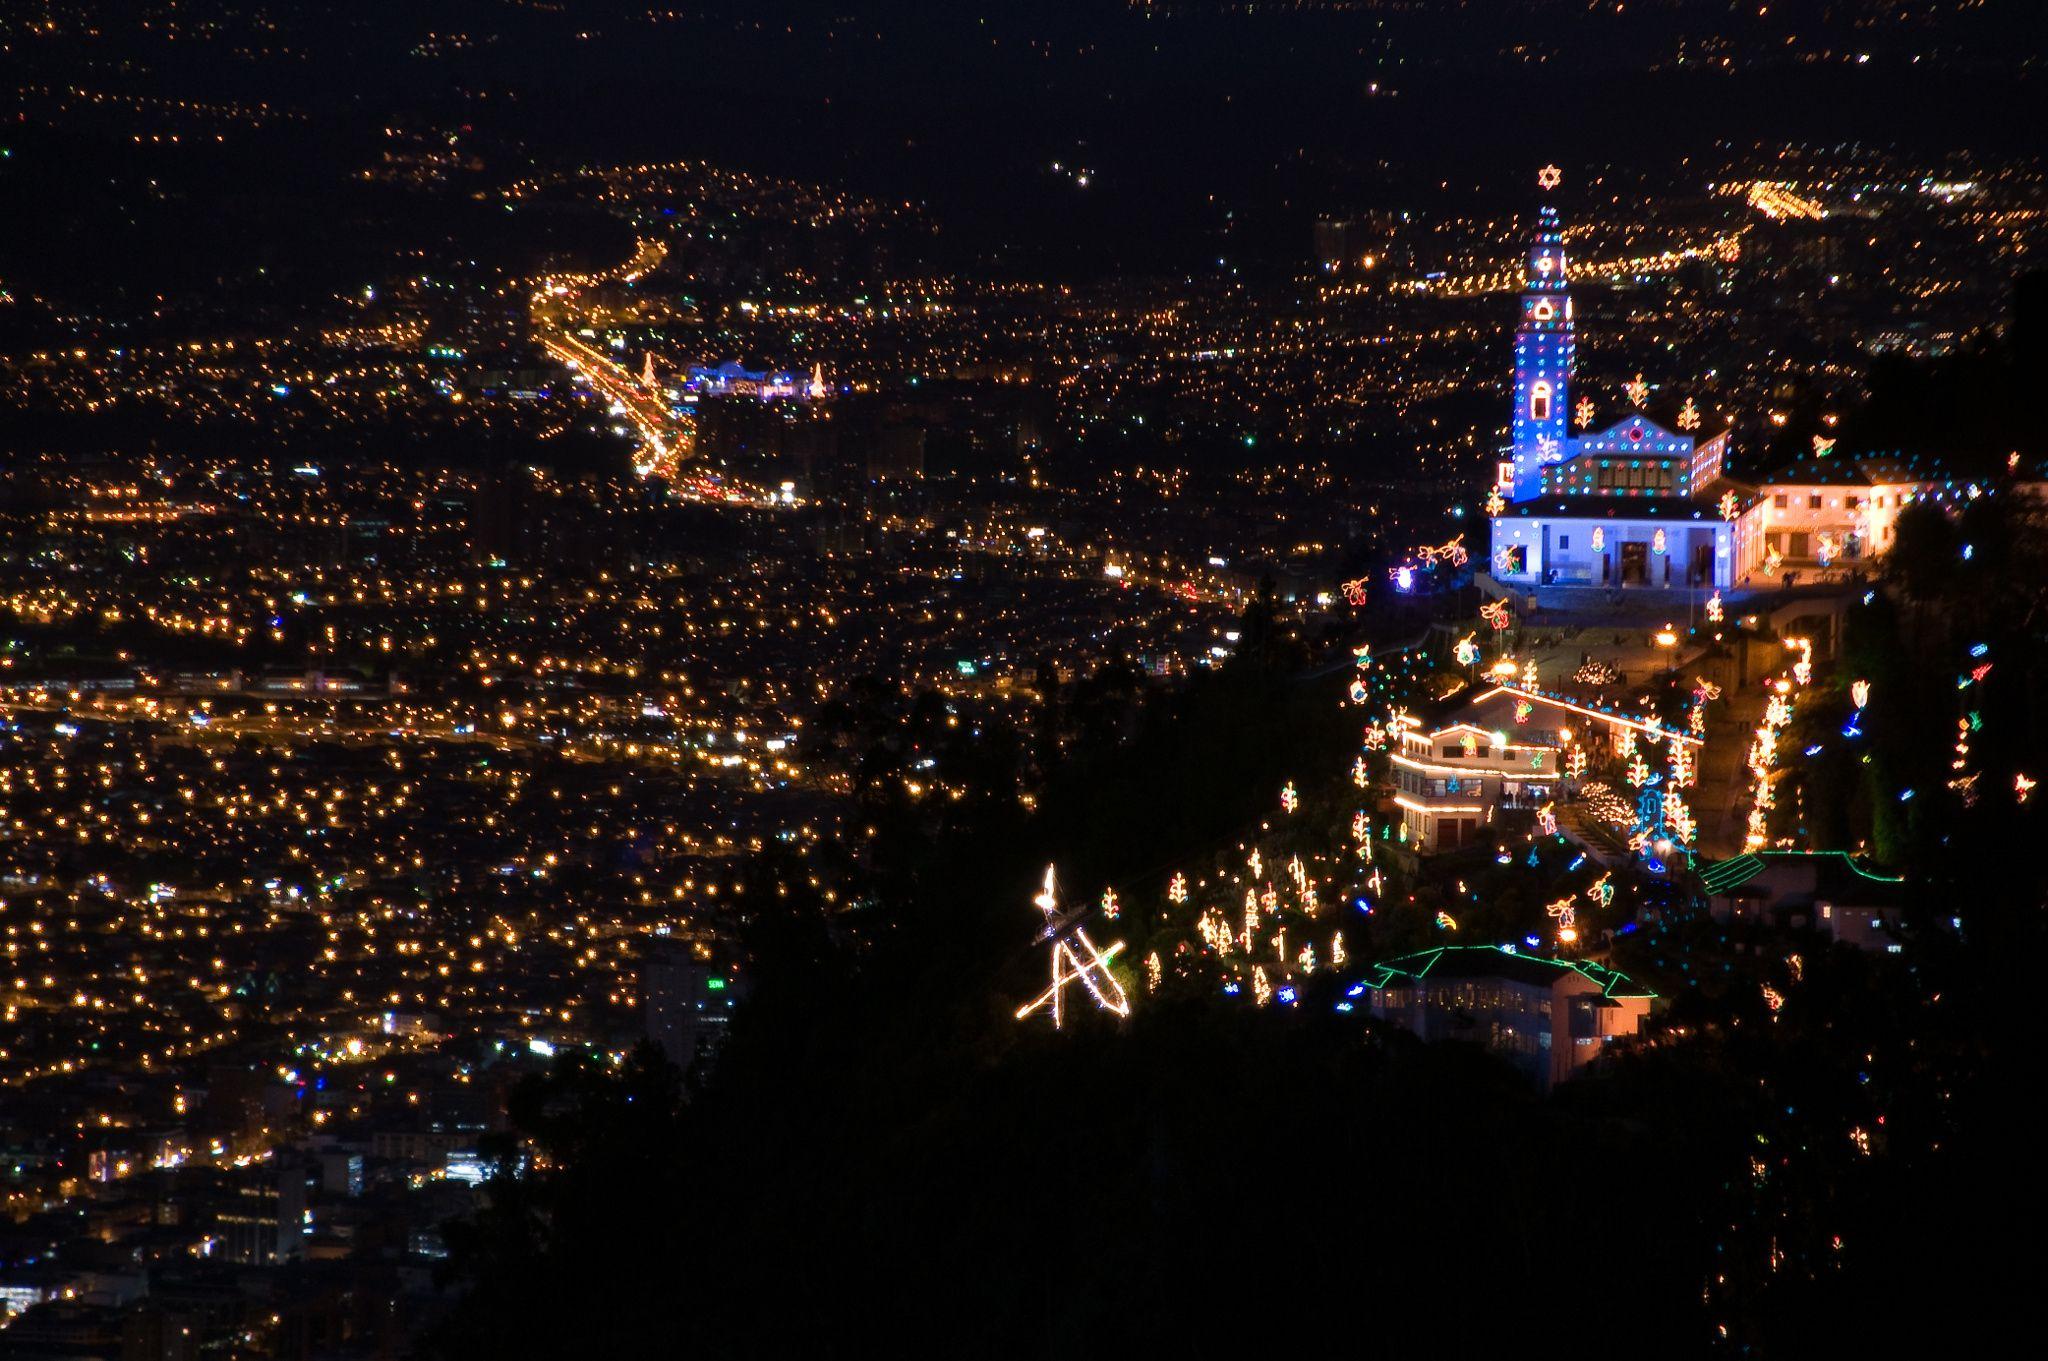 Vista nocturna de Bogotá - null